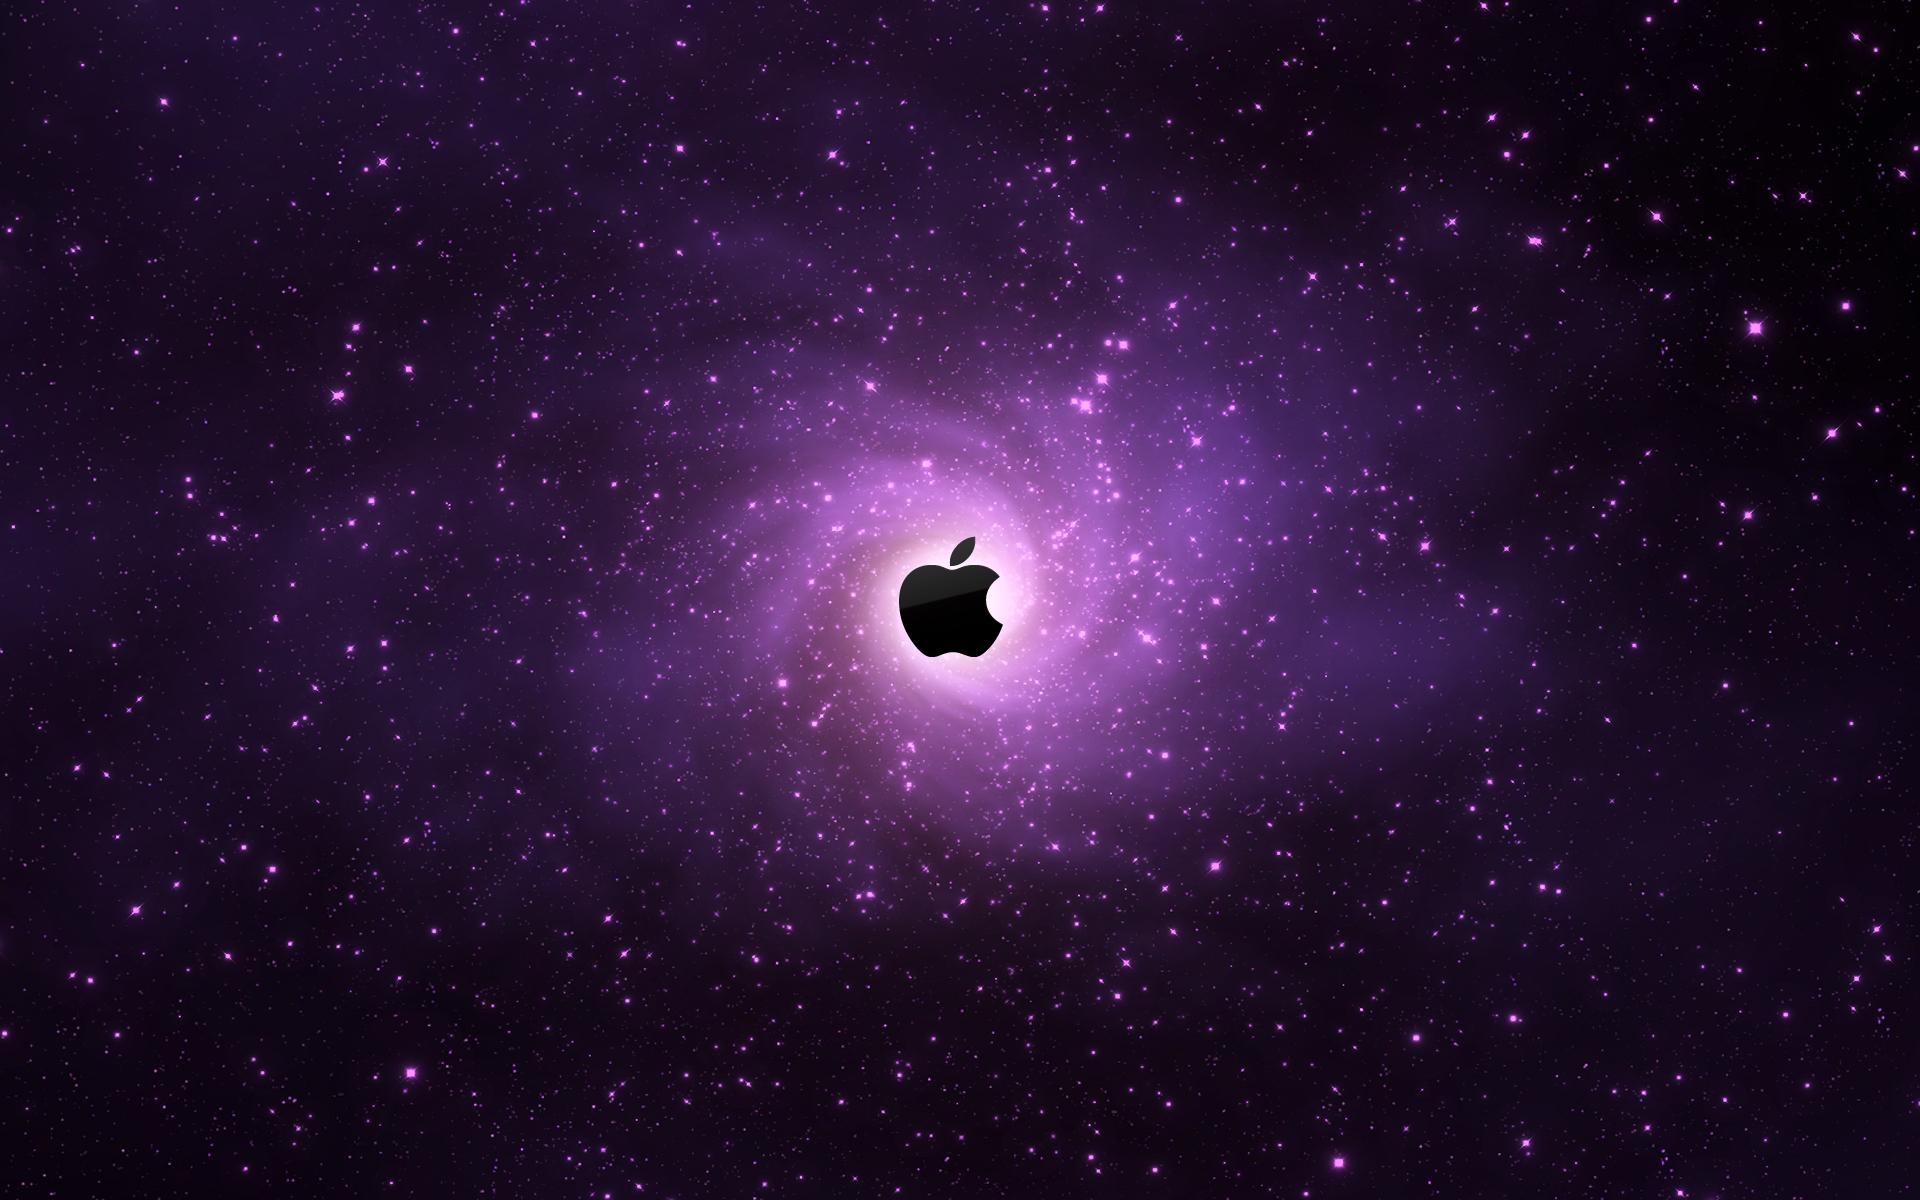 Apple Logo Dark Wallpapers HD Wallpapers 1920x1200